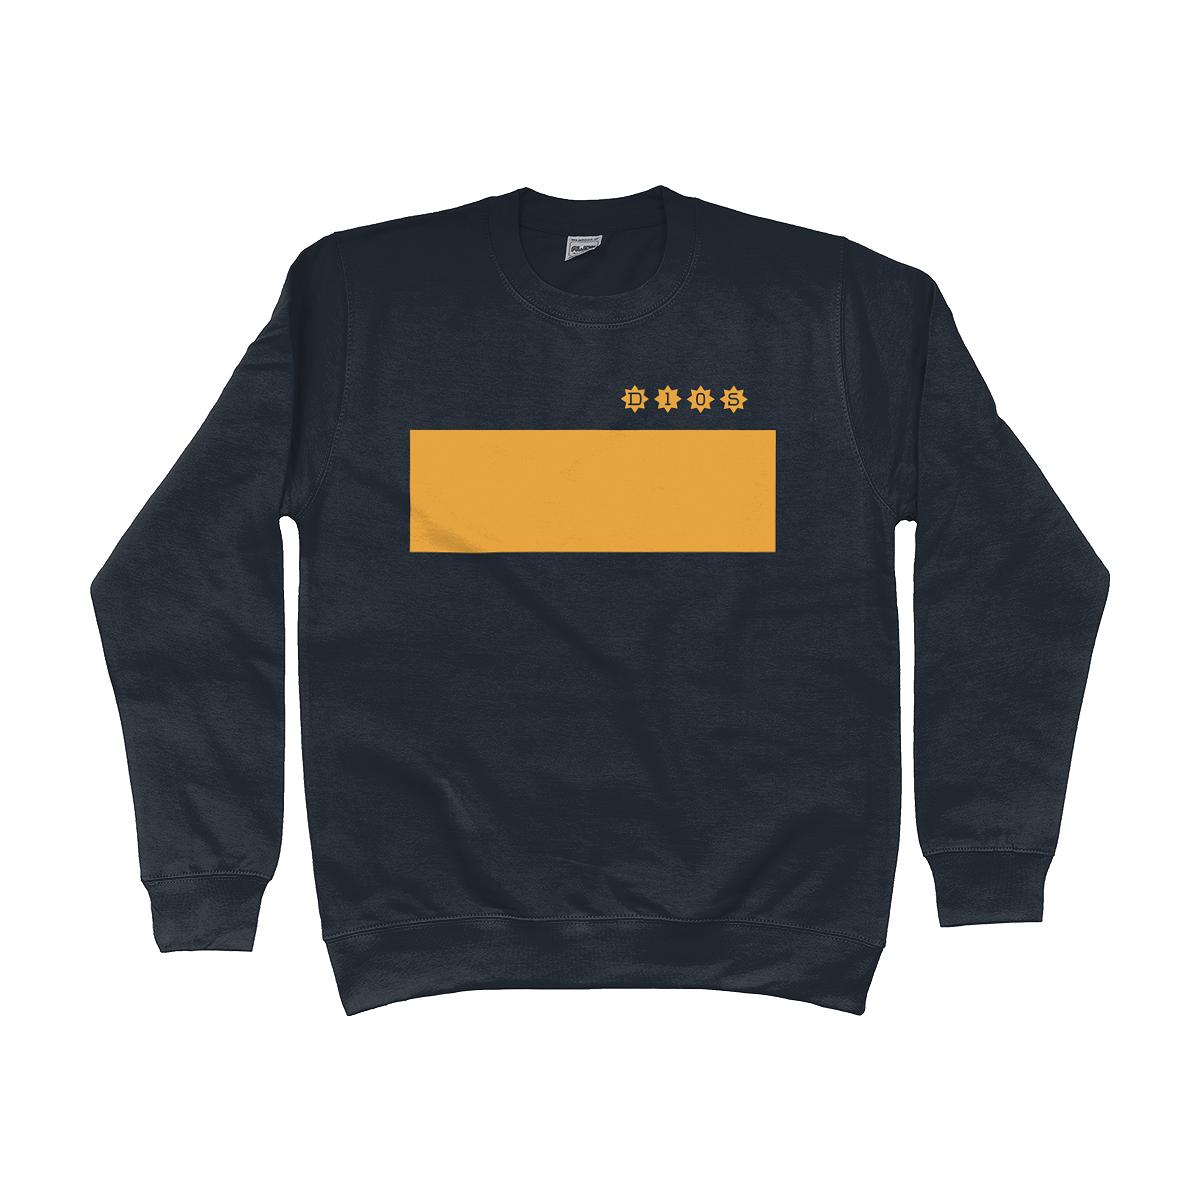 Maradona D10S 1981 Sweatshirt